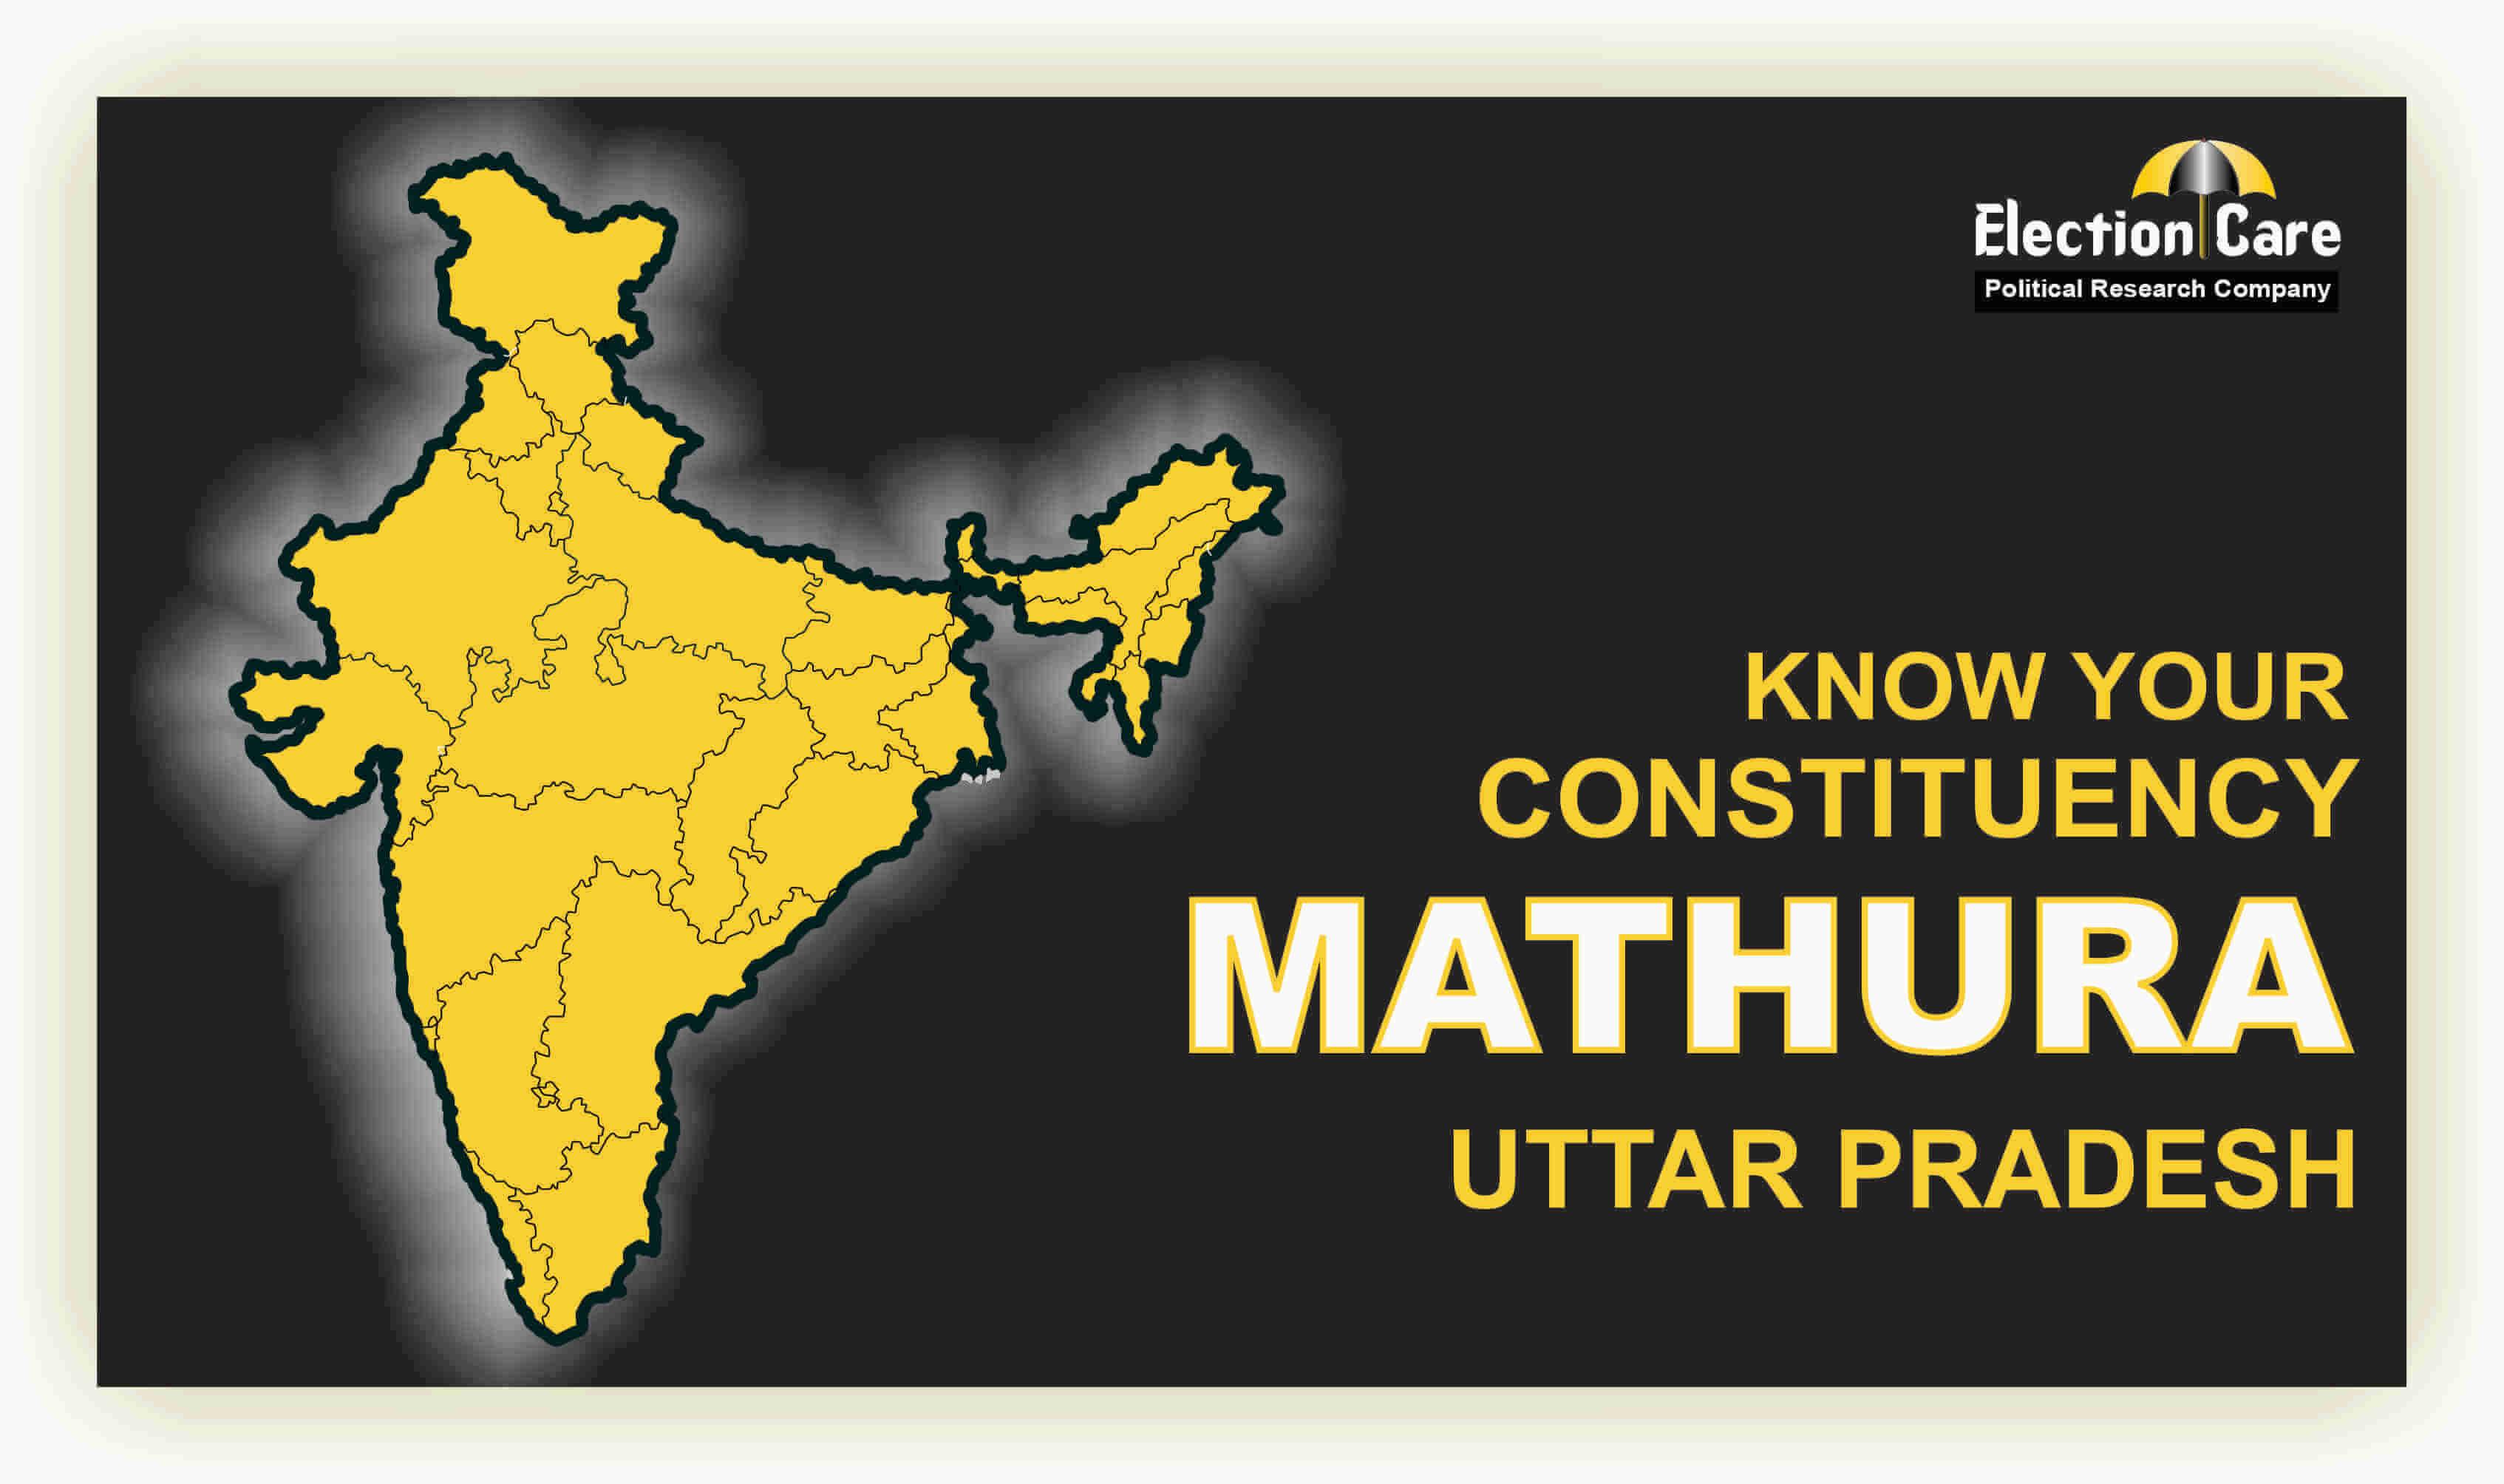 Mathura Parliament Election Result